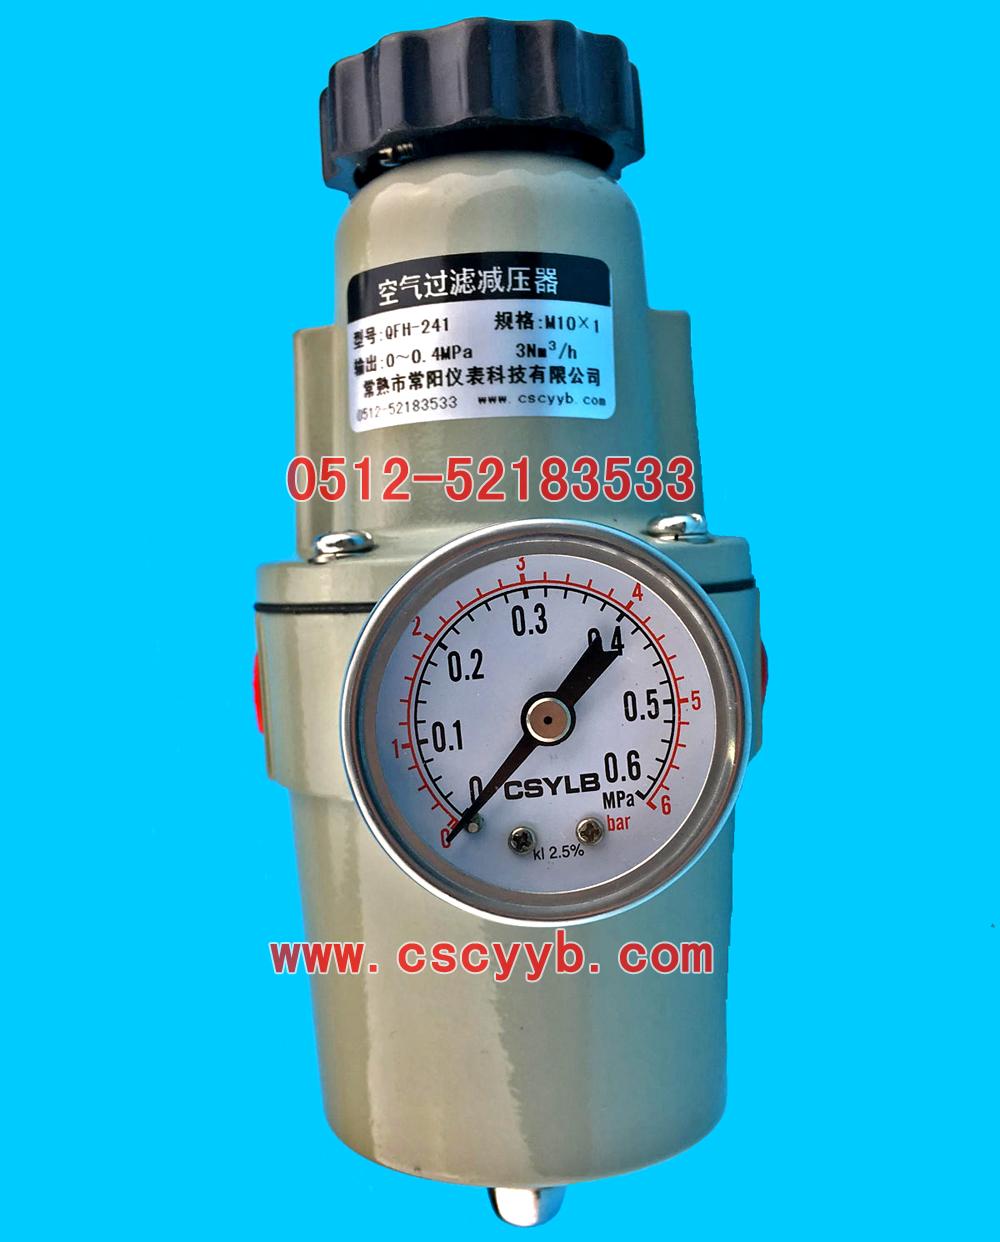 QFH-221空气过滤减压阀,常阳空气过滤减压阀QFH